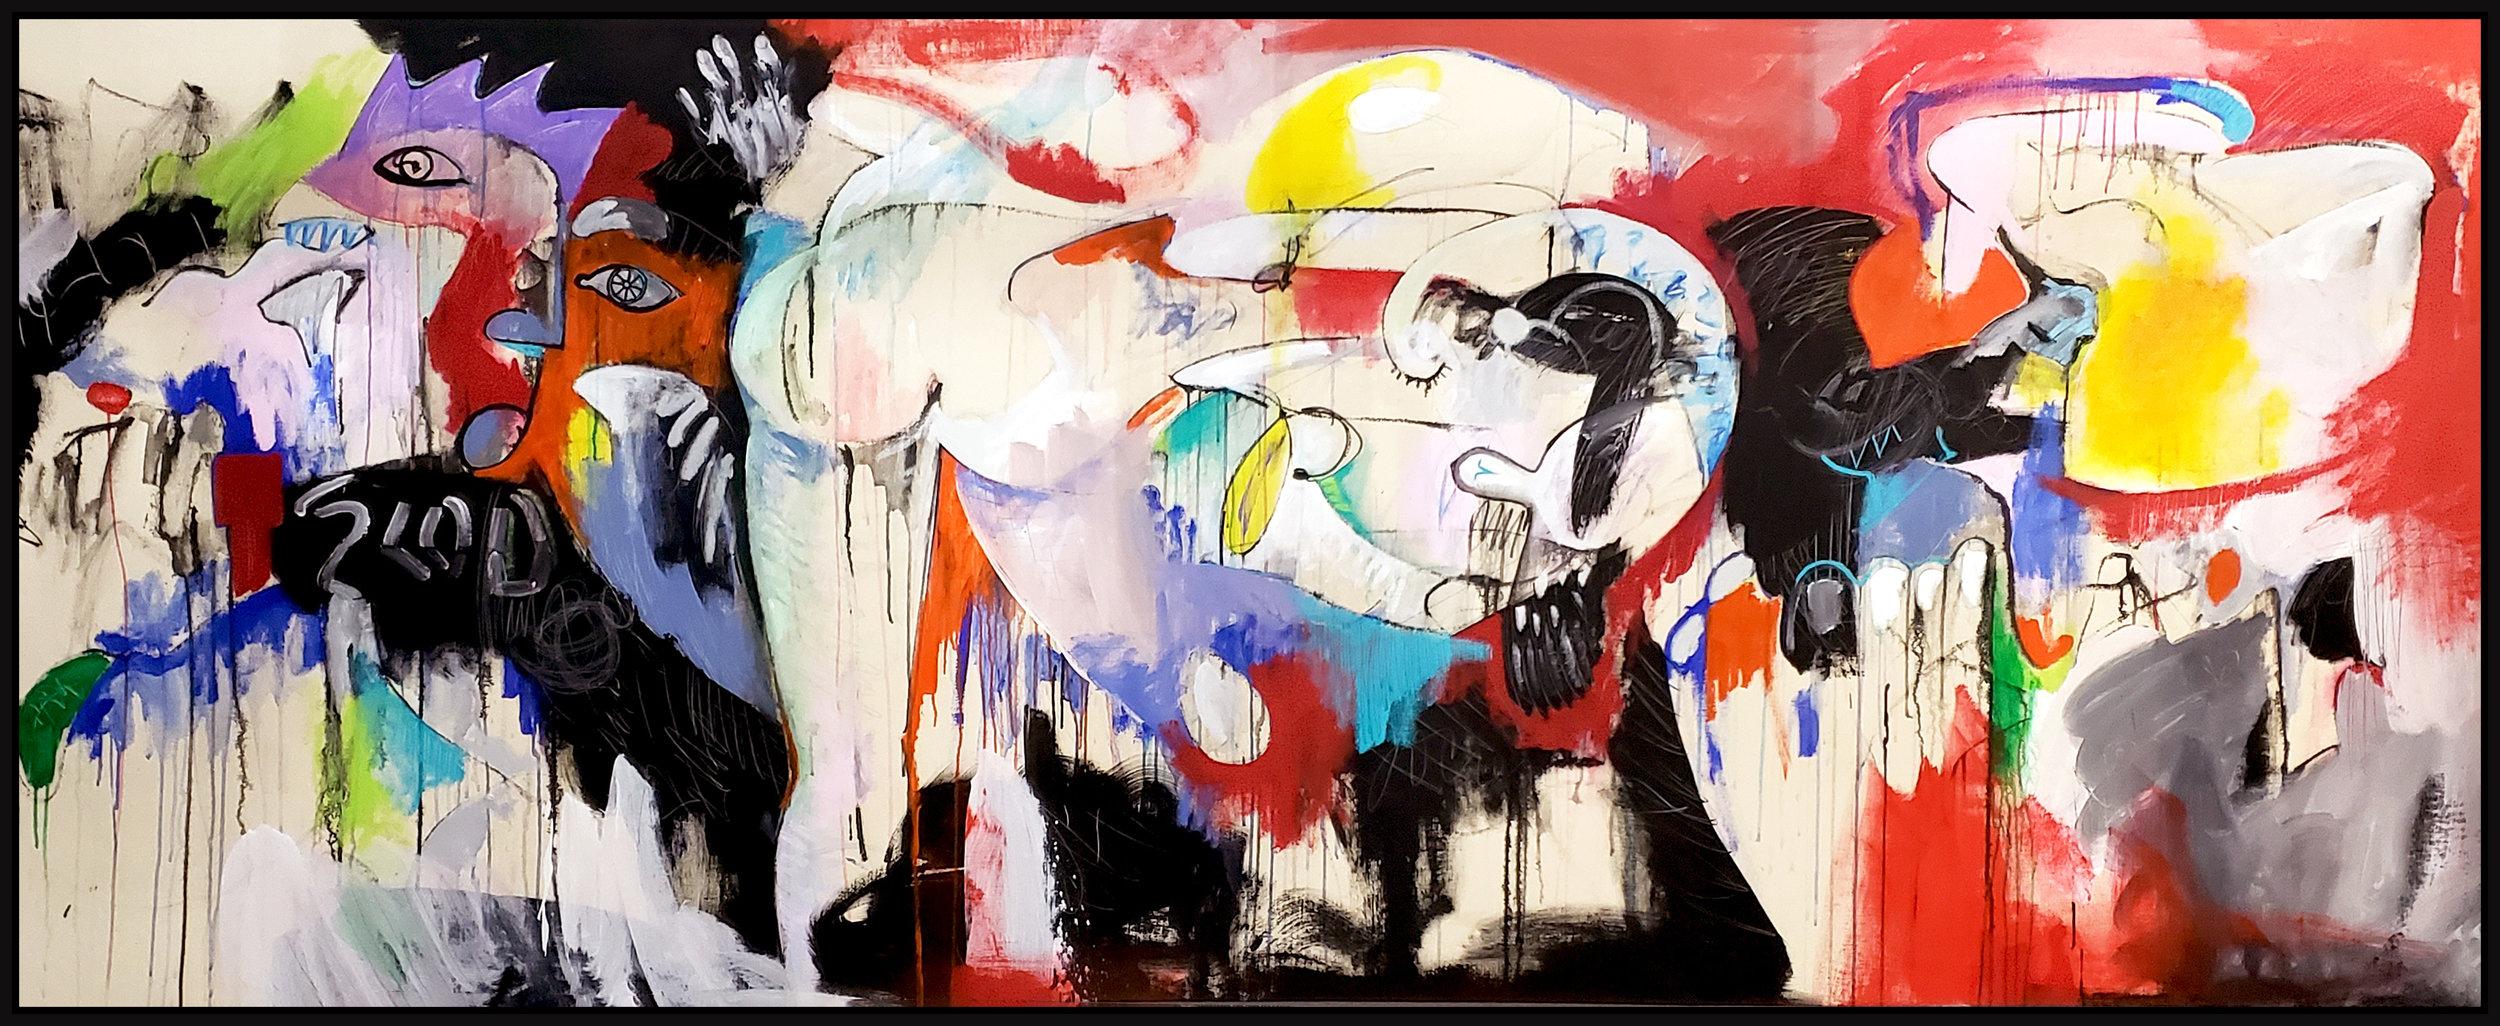 "Untitled #116, 2019, acrylic on canvas, 48"" x 120"" (122 x 305 cm)"